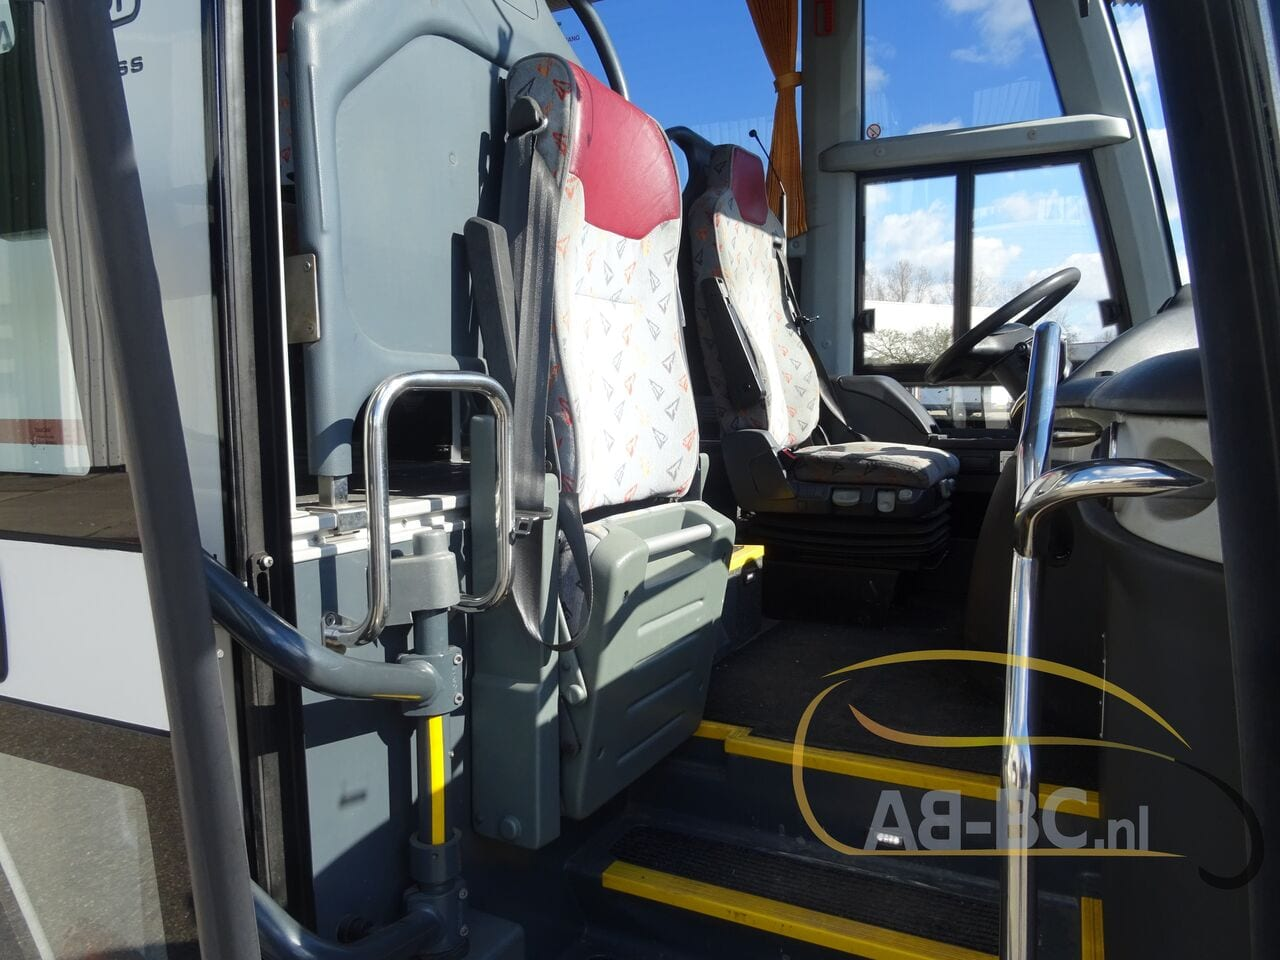 coach-busTEMSA-Safari-RD-53-Seats-DAF-Motor-12-mtr---1616166677142896324_big_193db15f62f5fdac2d04115e64c124a1--21031917053743807500